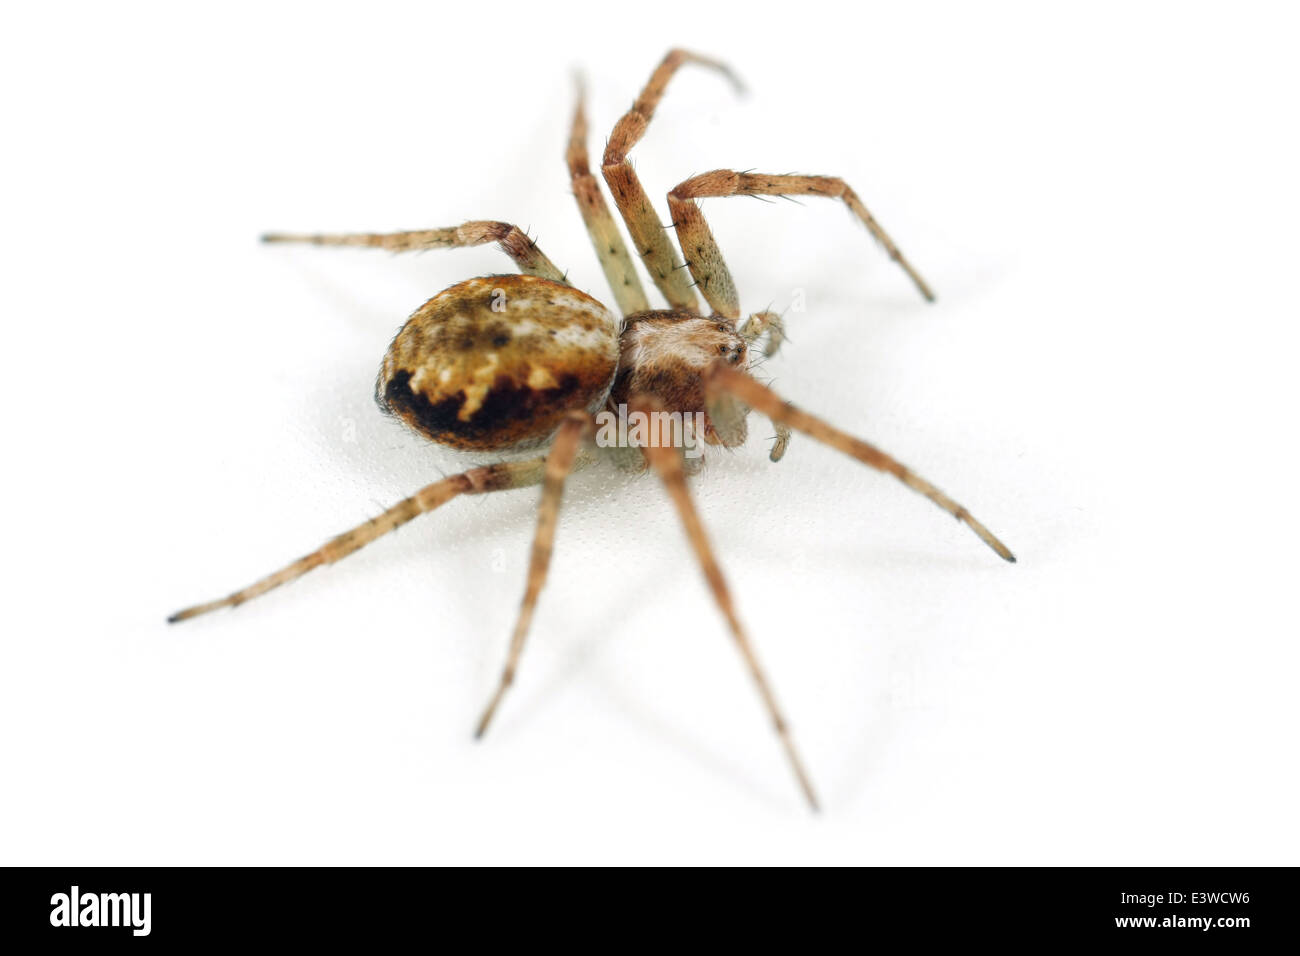 Female Turf running-spider (Philodromus cespitum), part of the family Philodromidae - Running crab spiders. Isolated Stock Photo